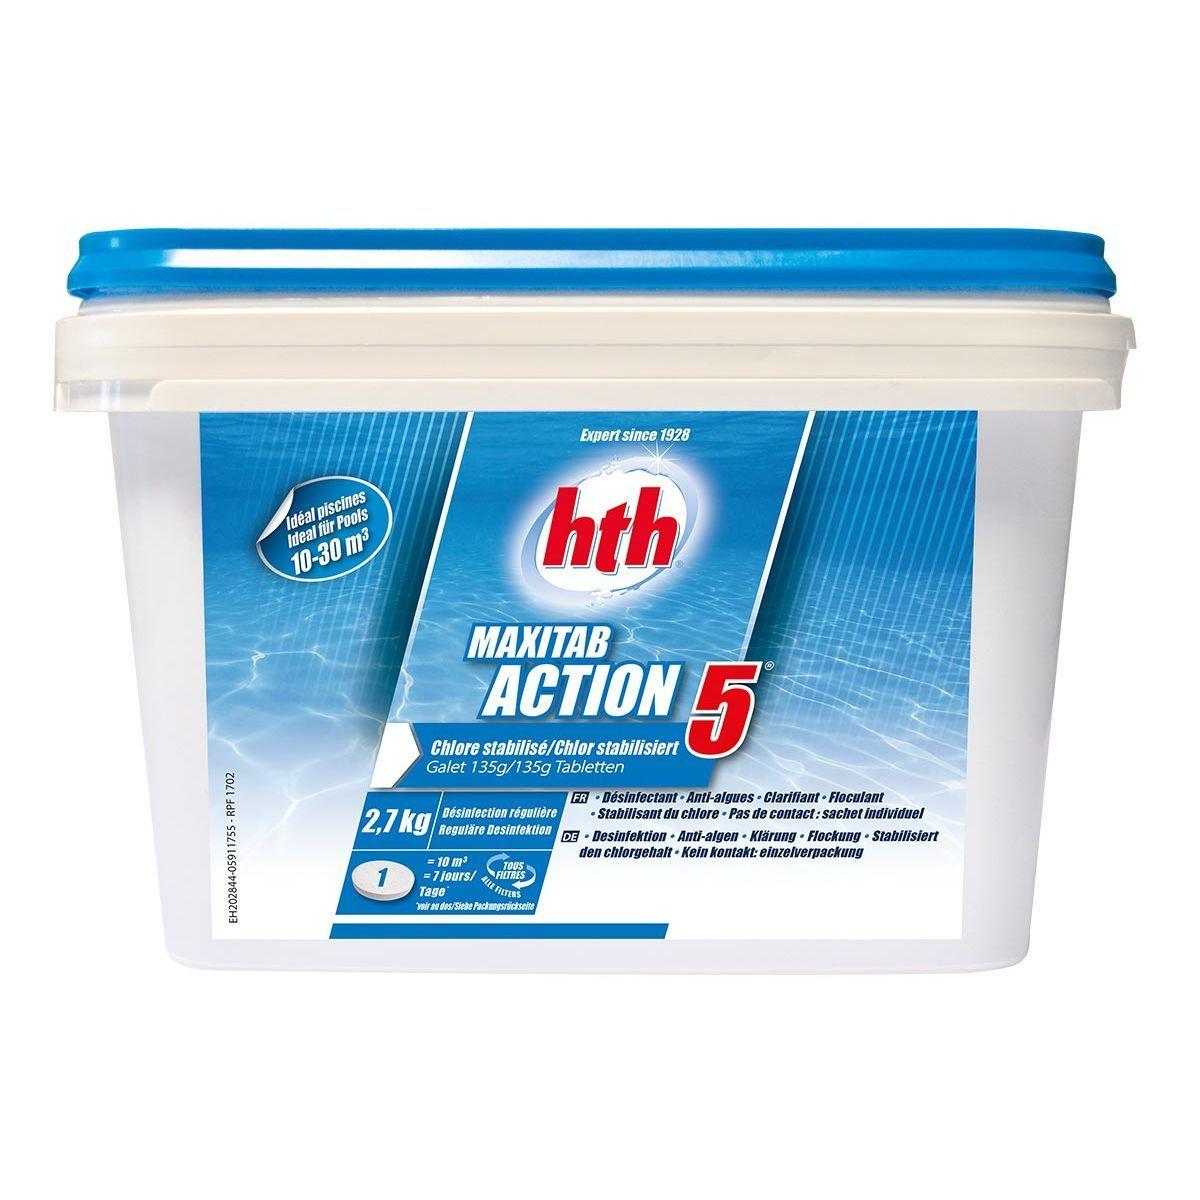 Chlore 5 Actions Maxitab Galets 135 G 2,7 Kg - Hth - Taille ... destiné Stabilisant Piscine